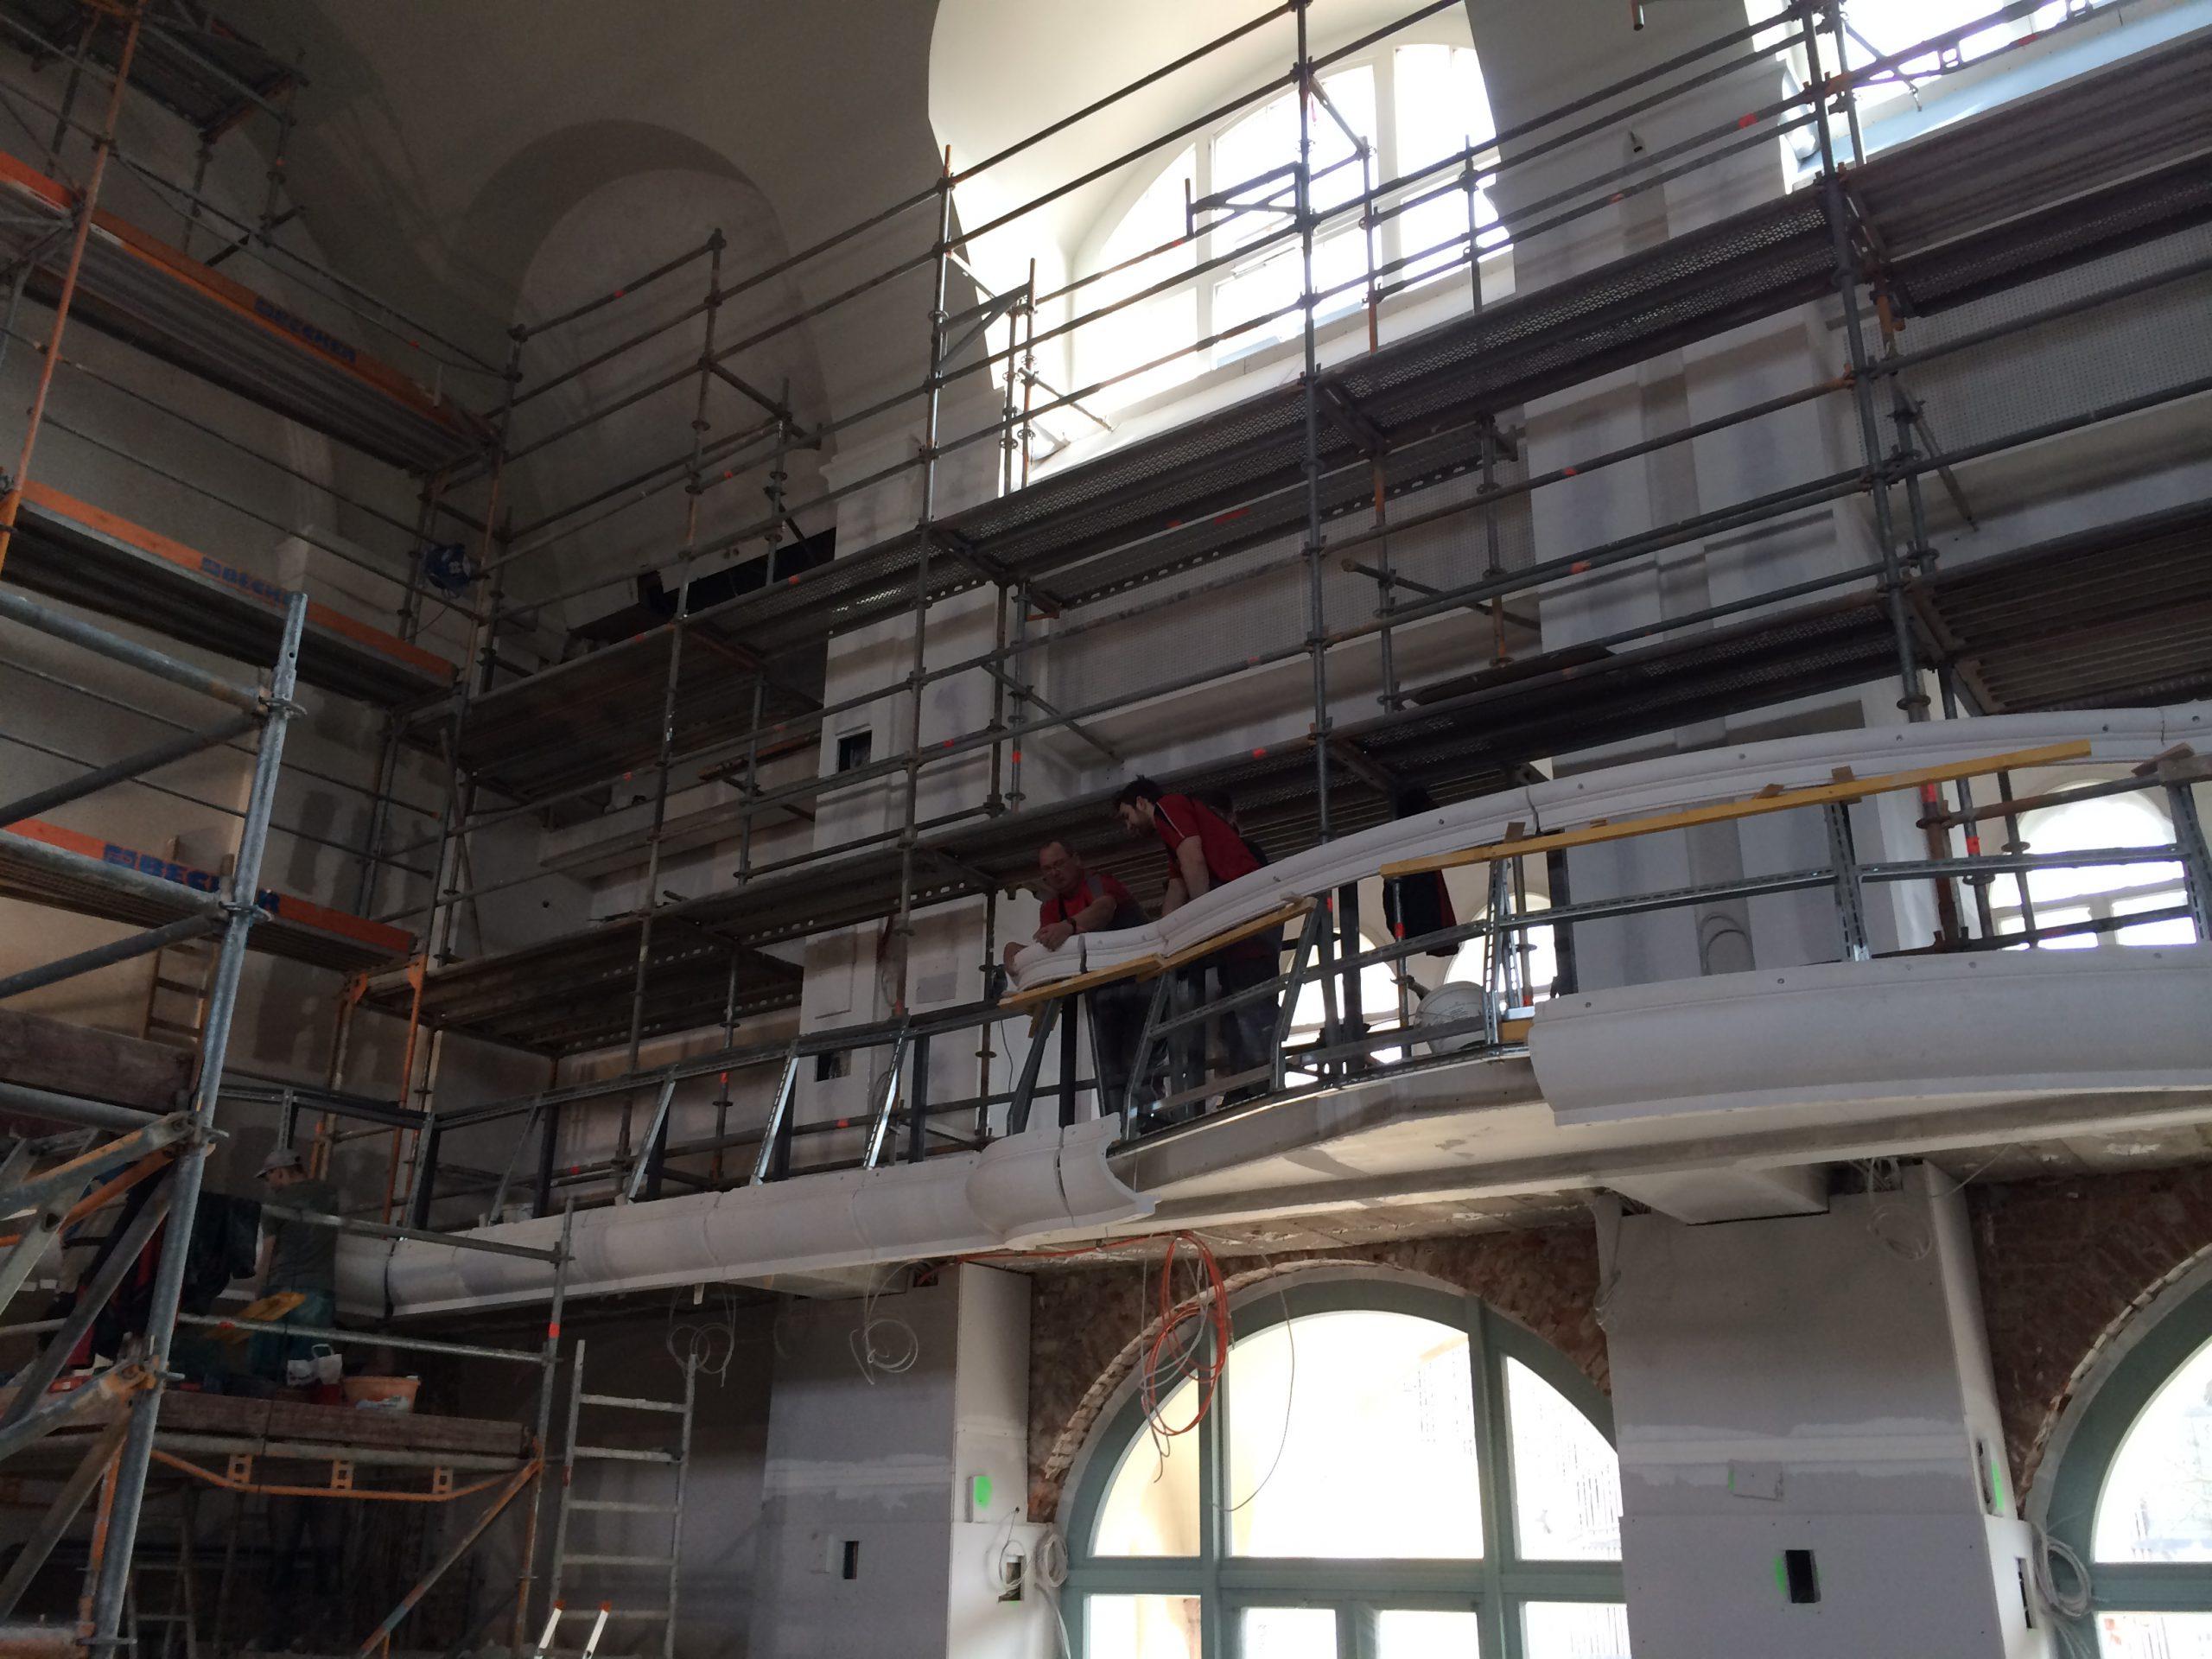 Großer Saal im Bau